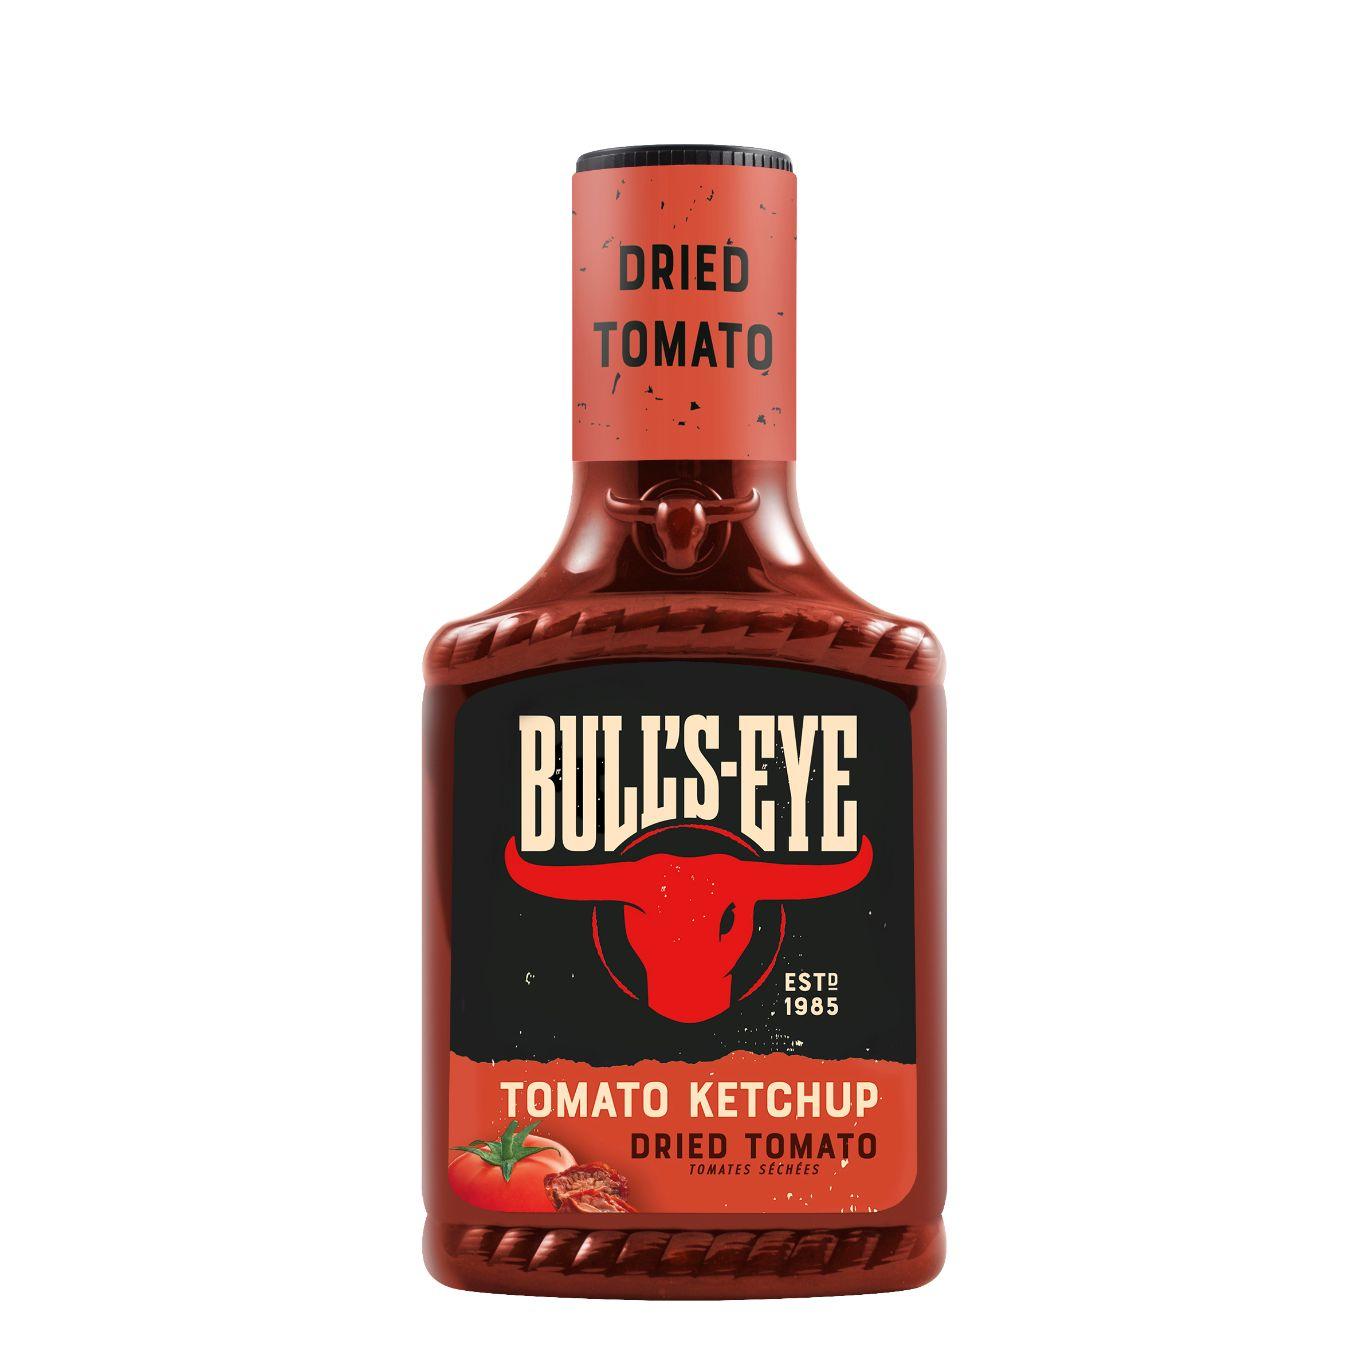 Bull's Eye Tomato Ketchup 480g Verre image